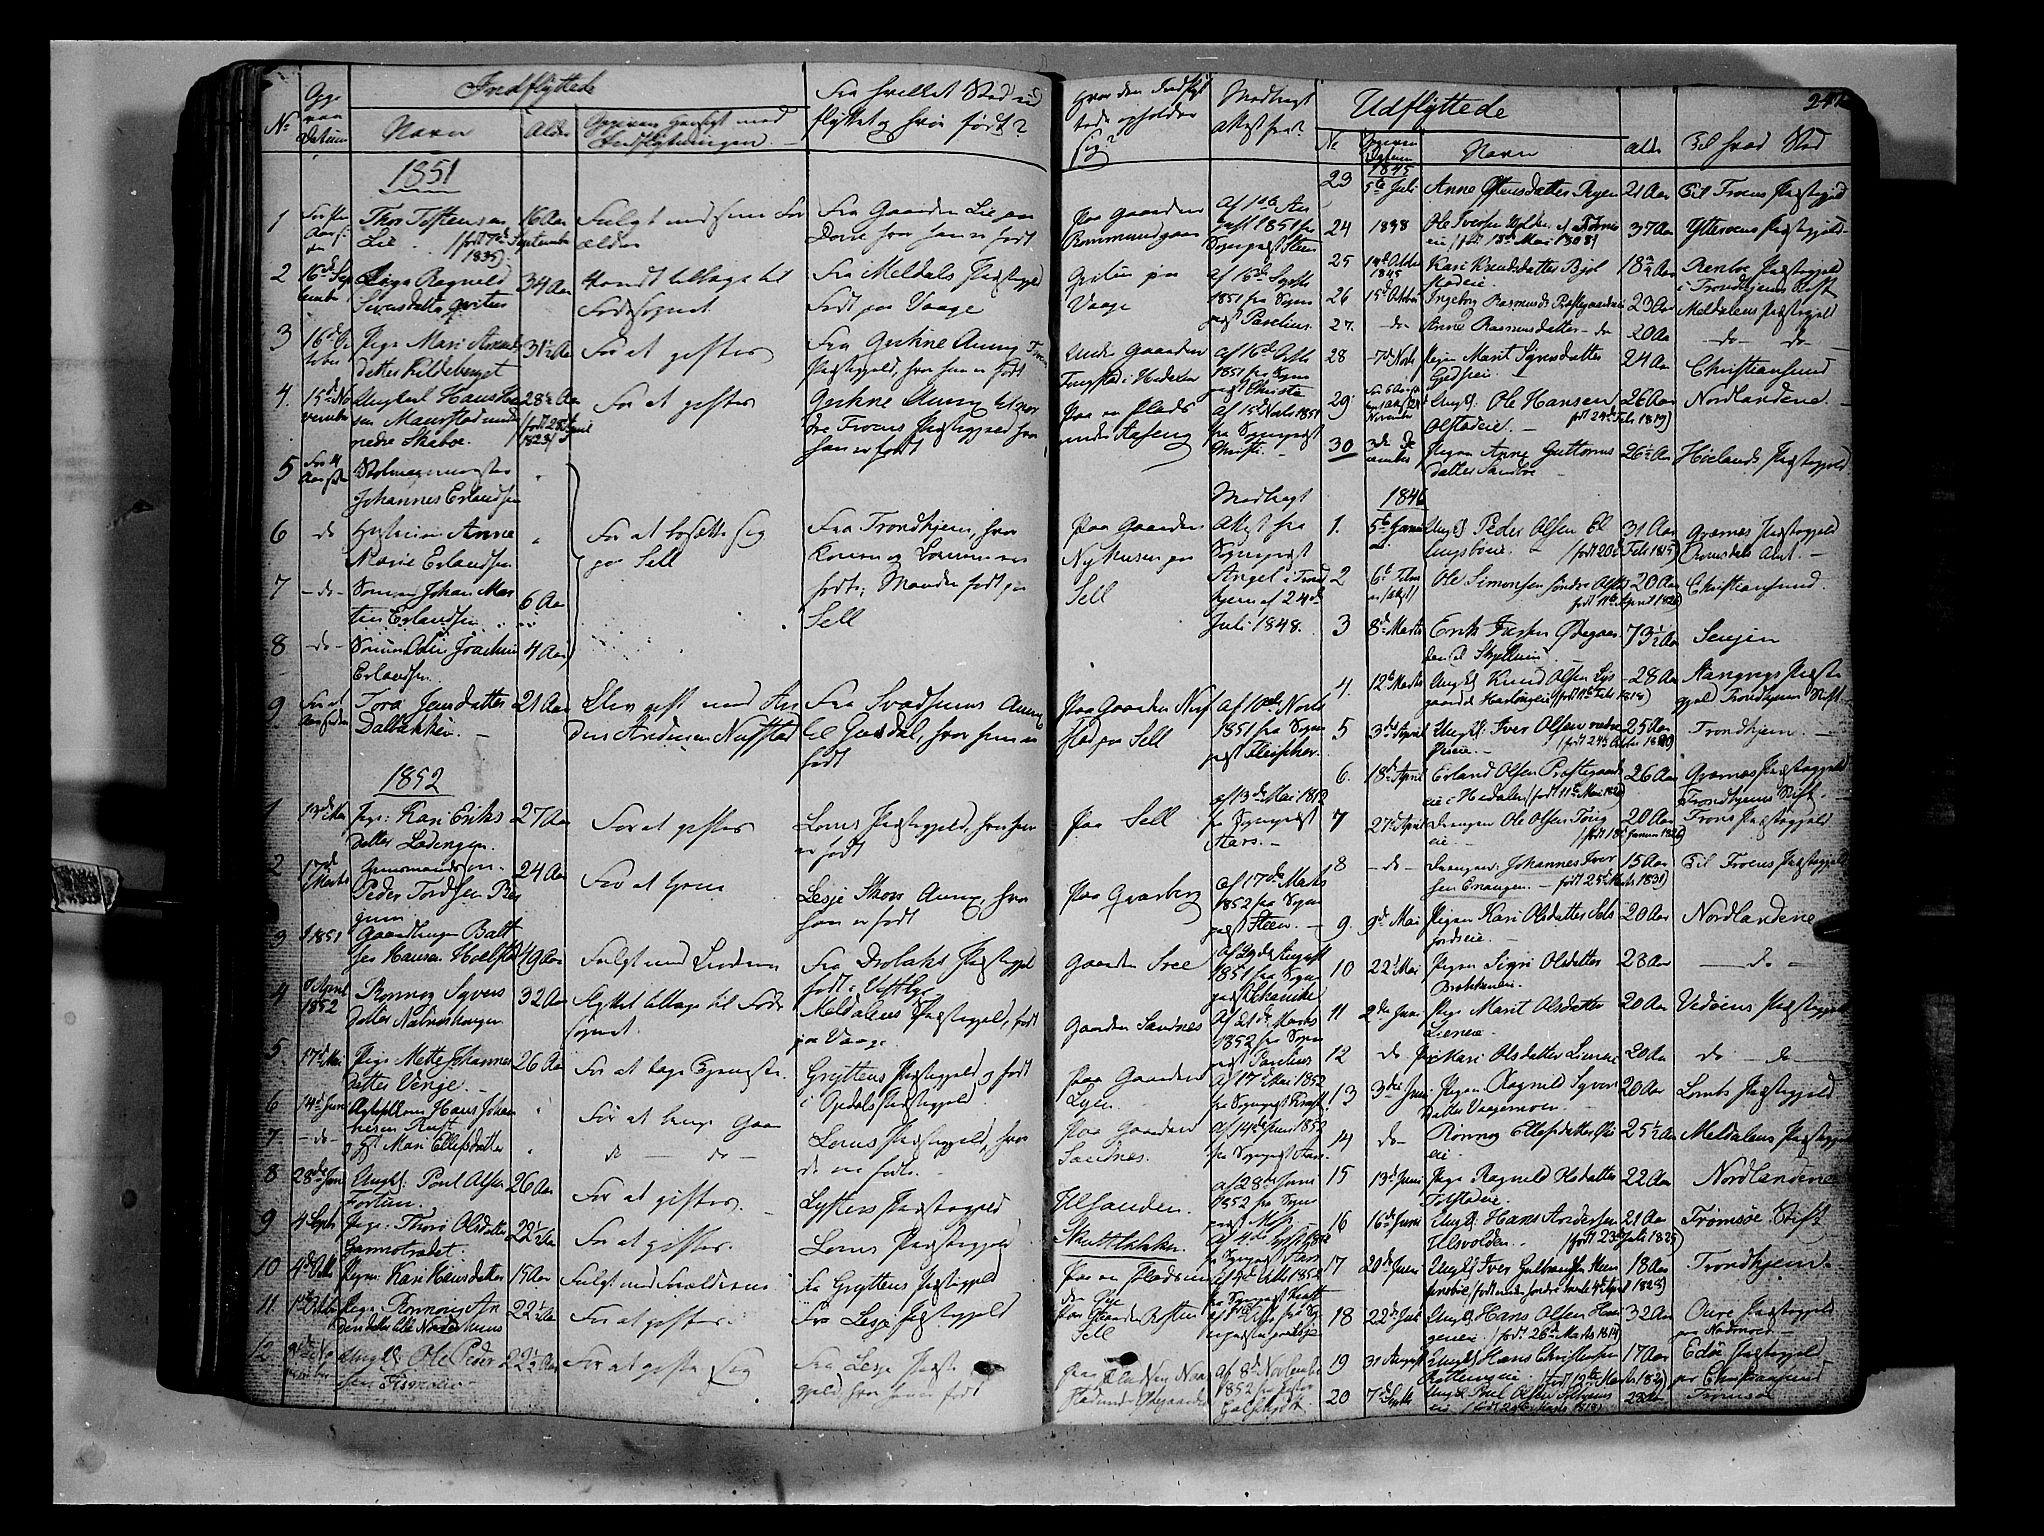 SAH, Vågå prestekontor, Ministerialbok nr. 5 /1, 1842-1856, s. 247